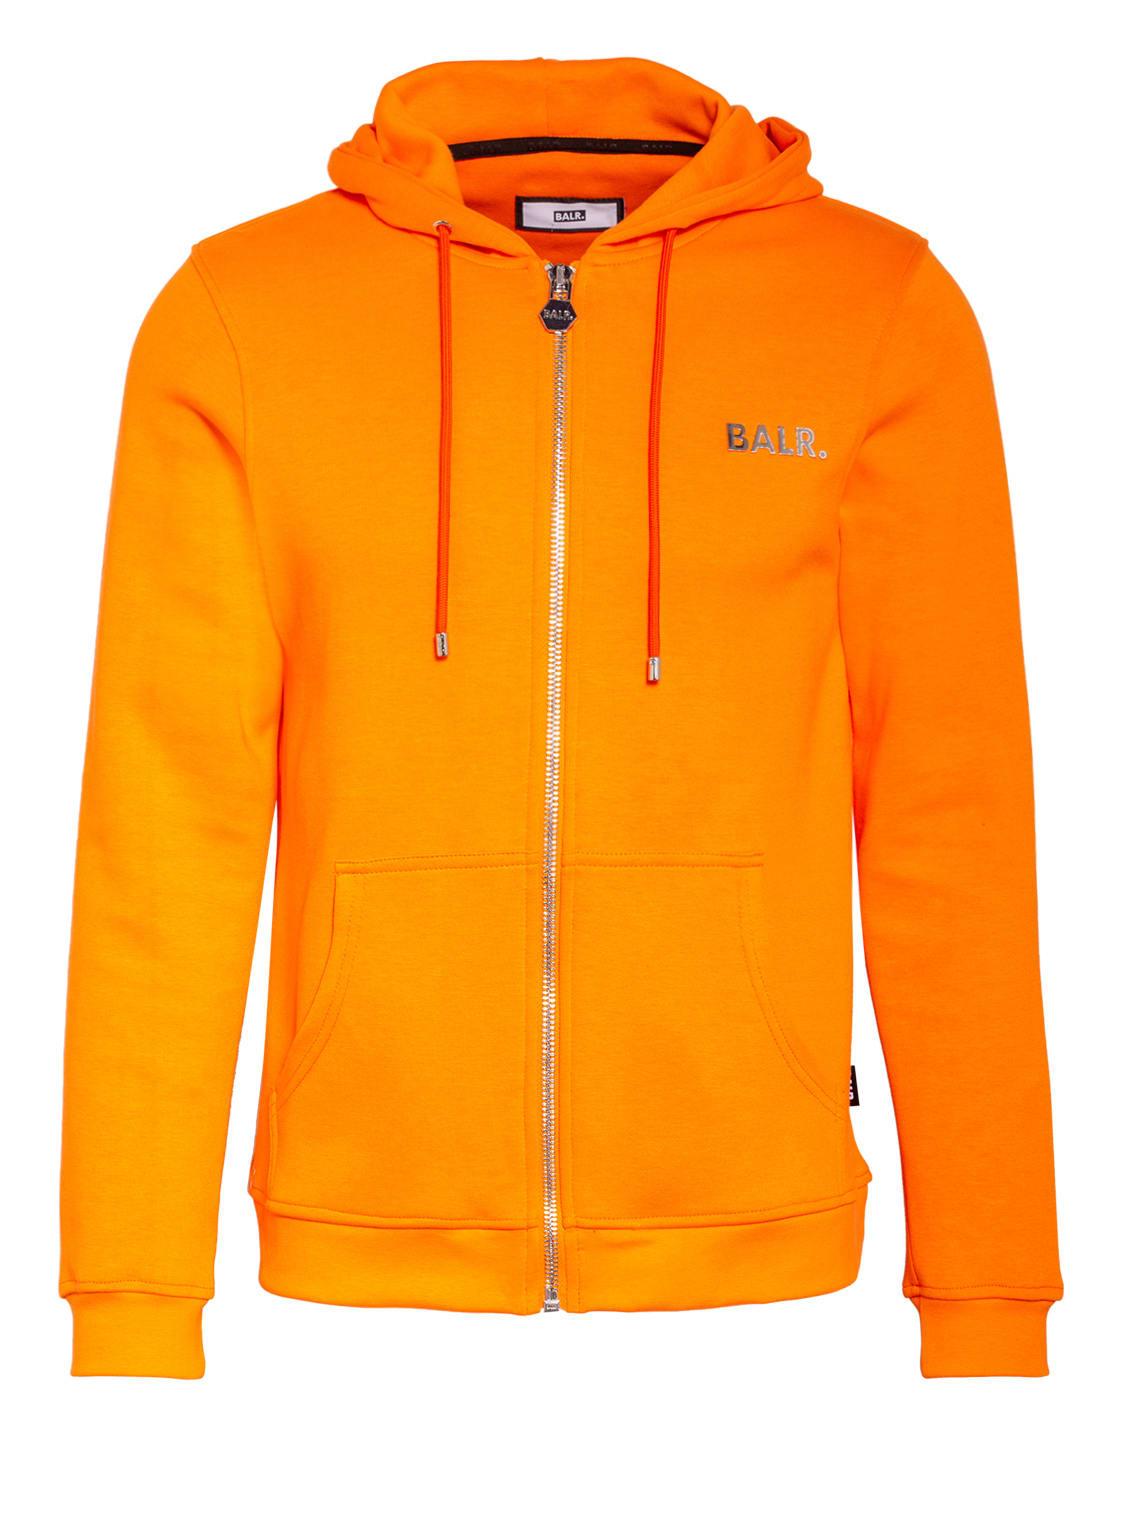 Image of Balr. Sweatjacke orange